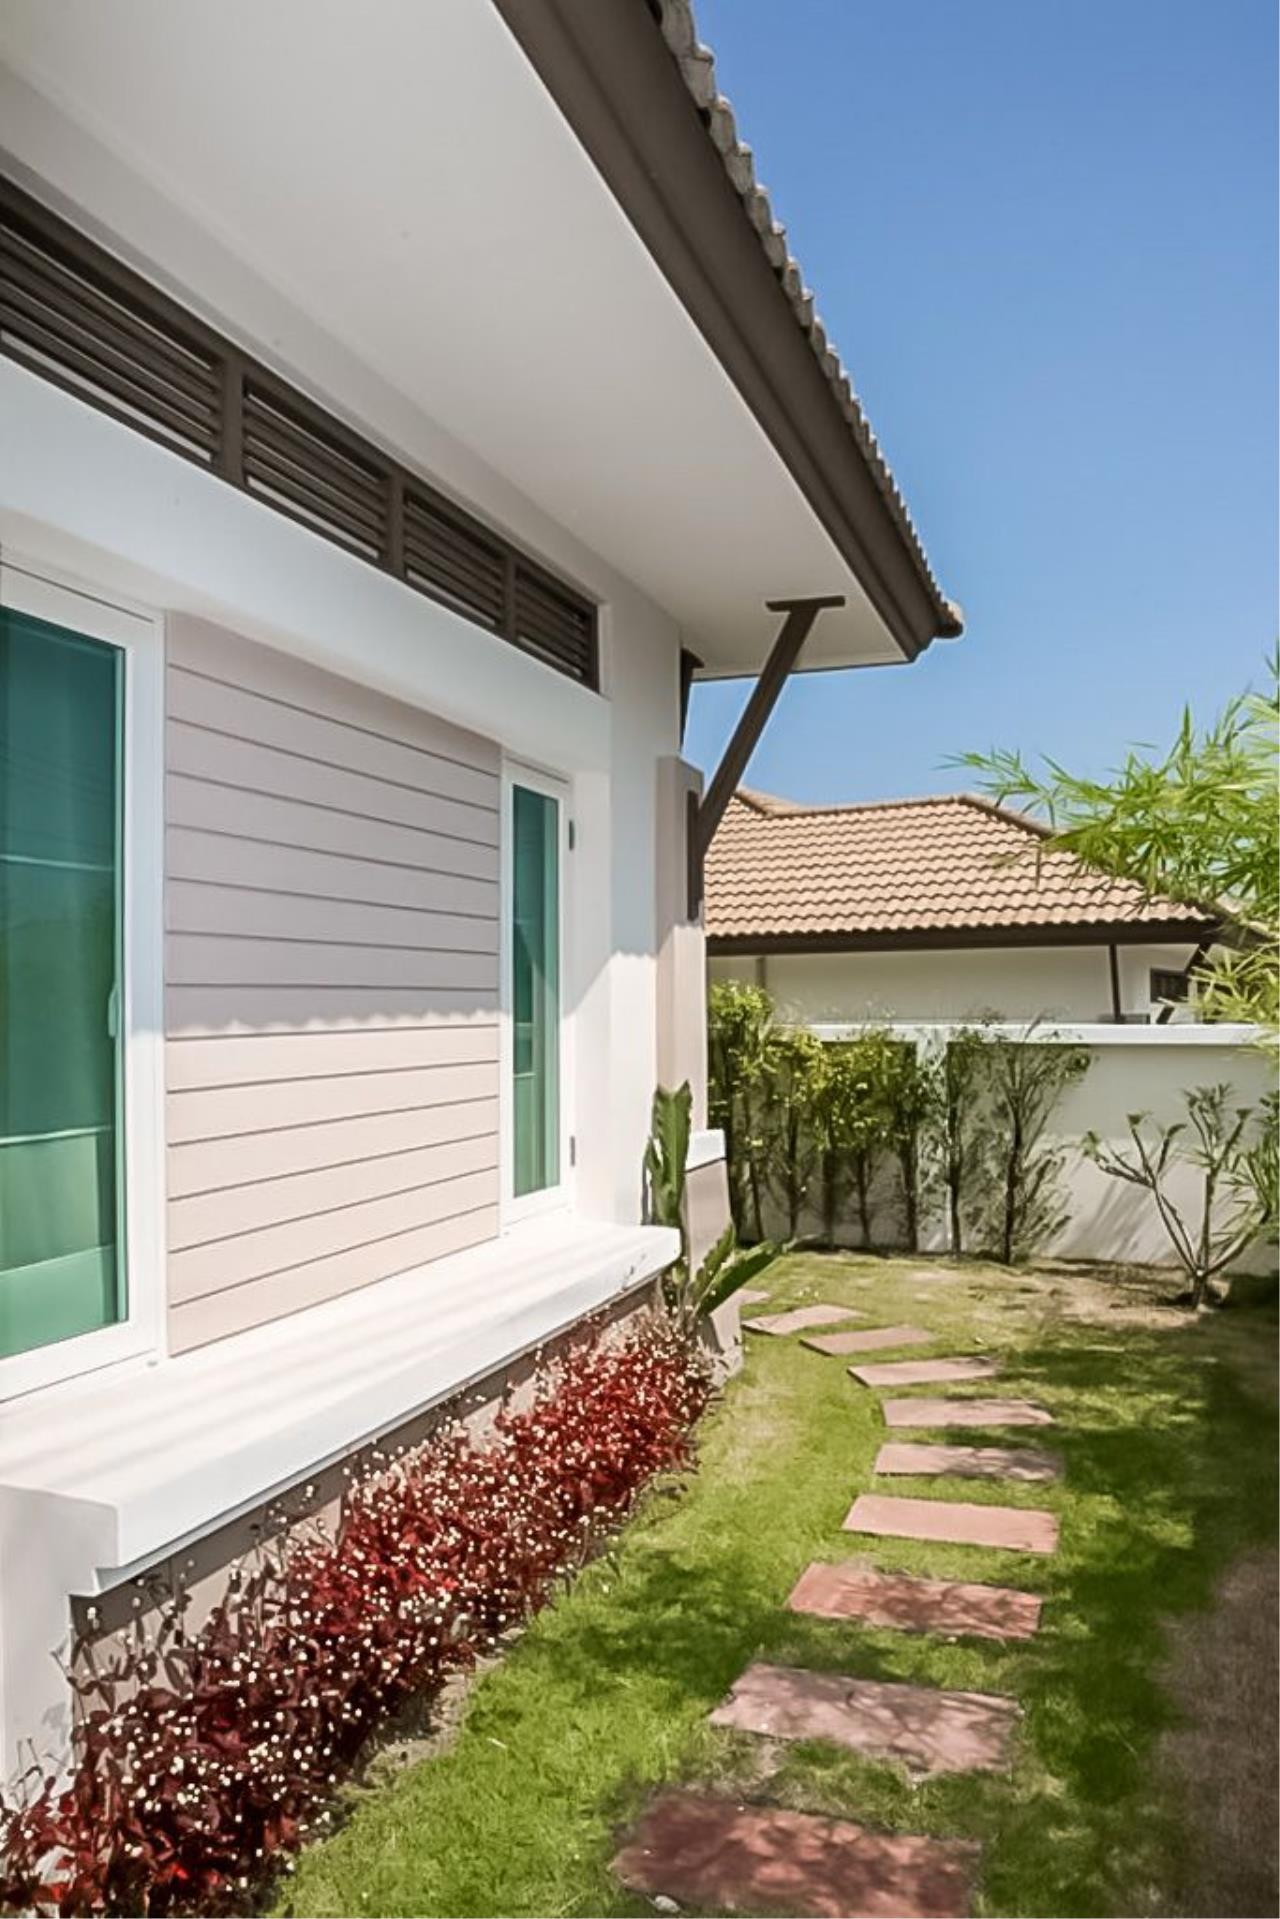 Thaiproperty1 Agency's Sida Tropical Villas 4 - Hua Hin  21